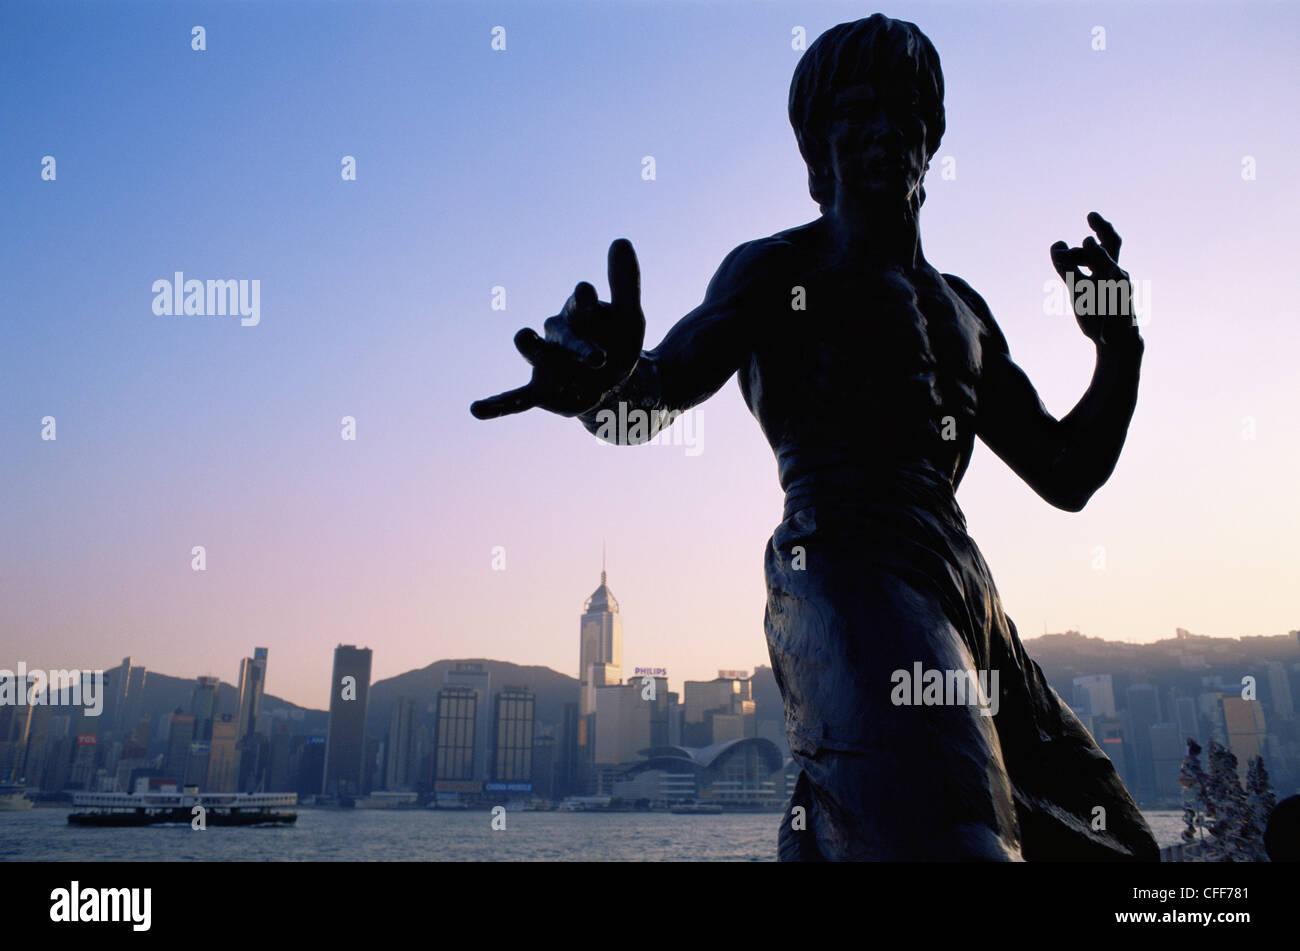 China, Hong Kong, Kowloon, Tsim Sha Tsui, Avenue of the Stars, Bruce Lee Statue - Stock Image